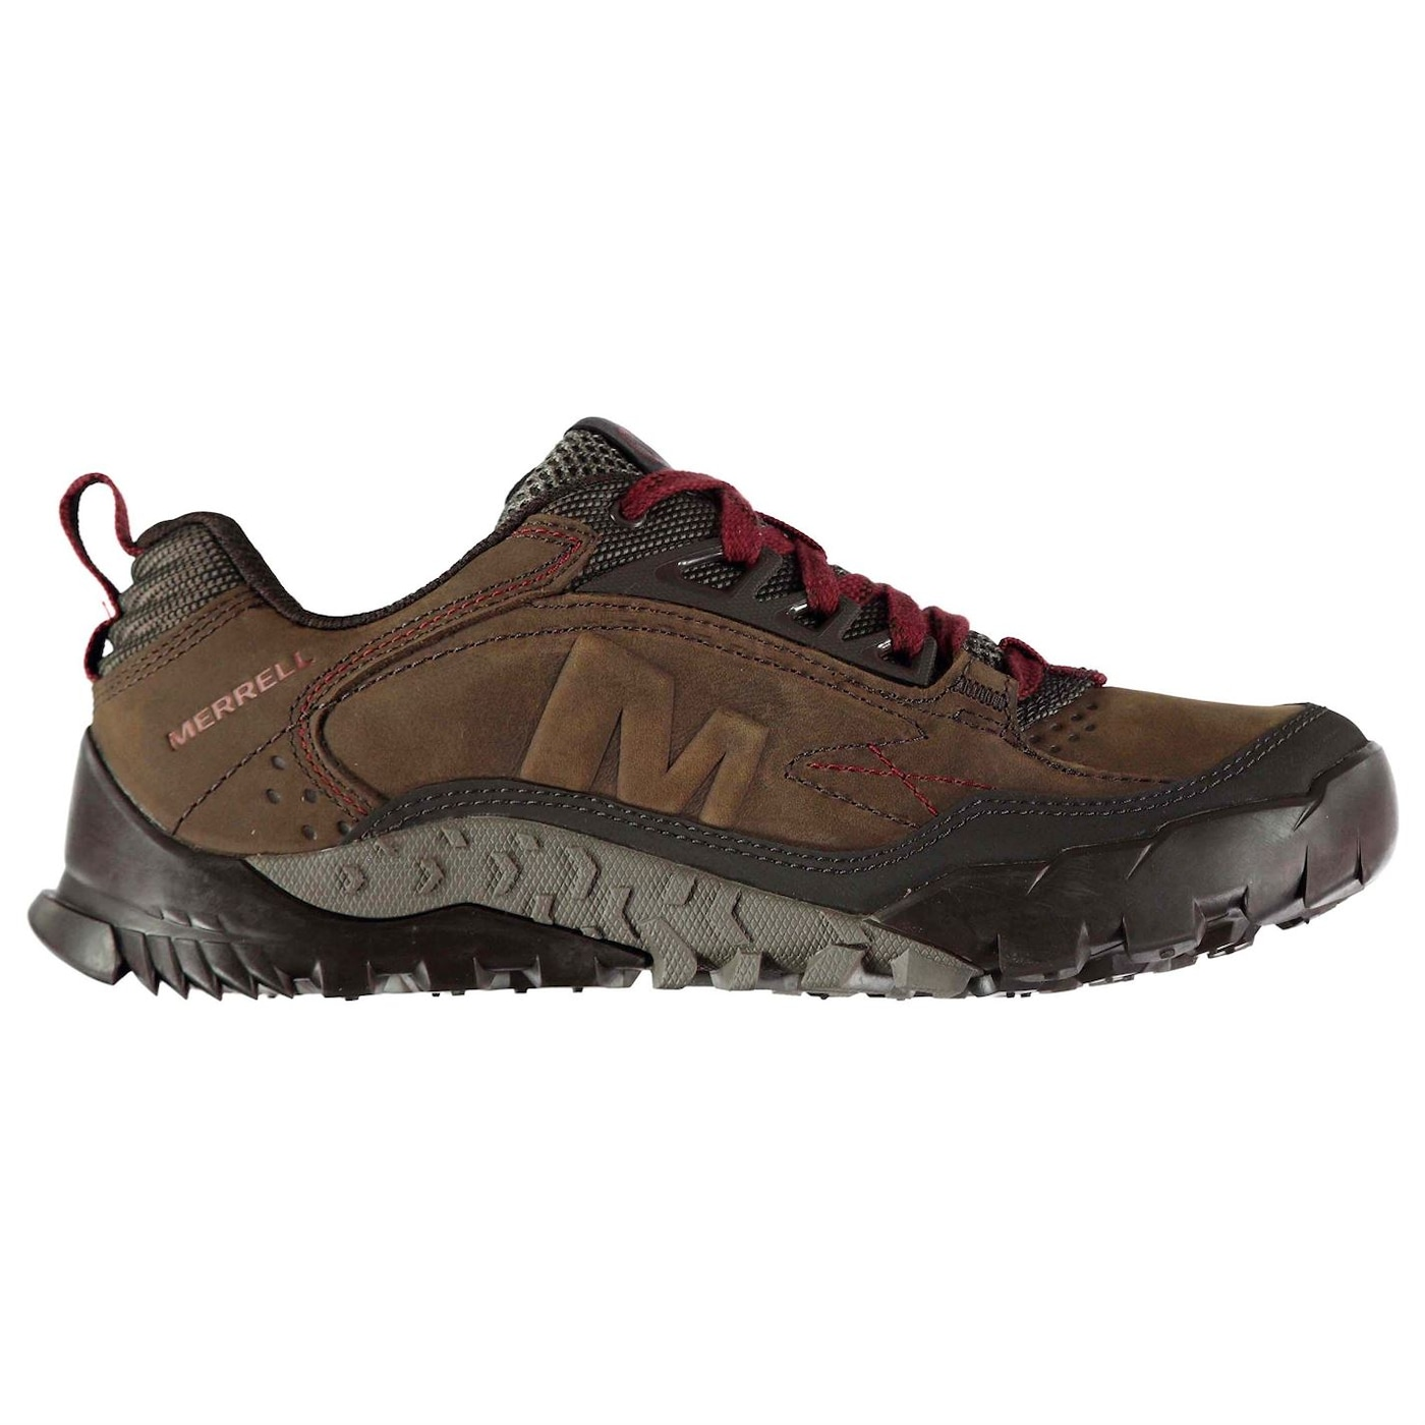 Merrell Annex TRAK Low Mens Walking Shoes Brown Nubuck Leather Vibram Sole